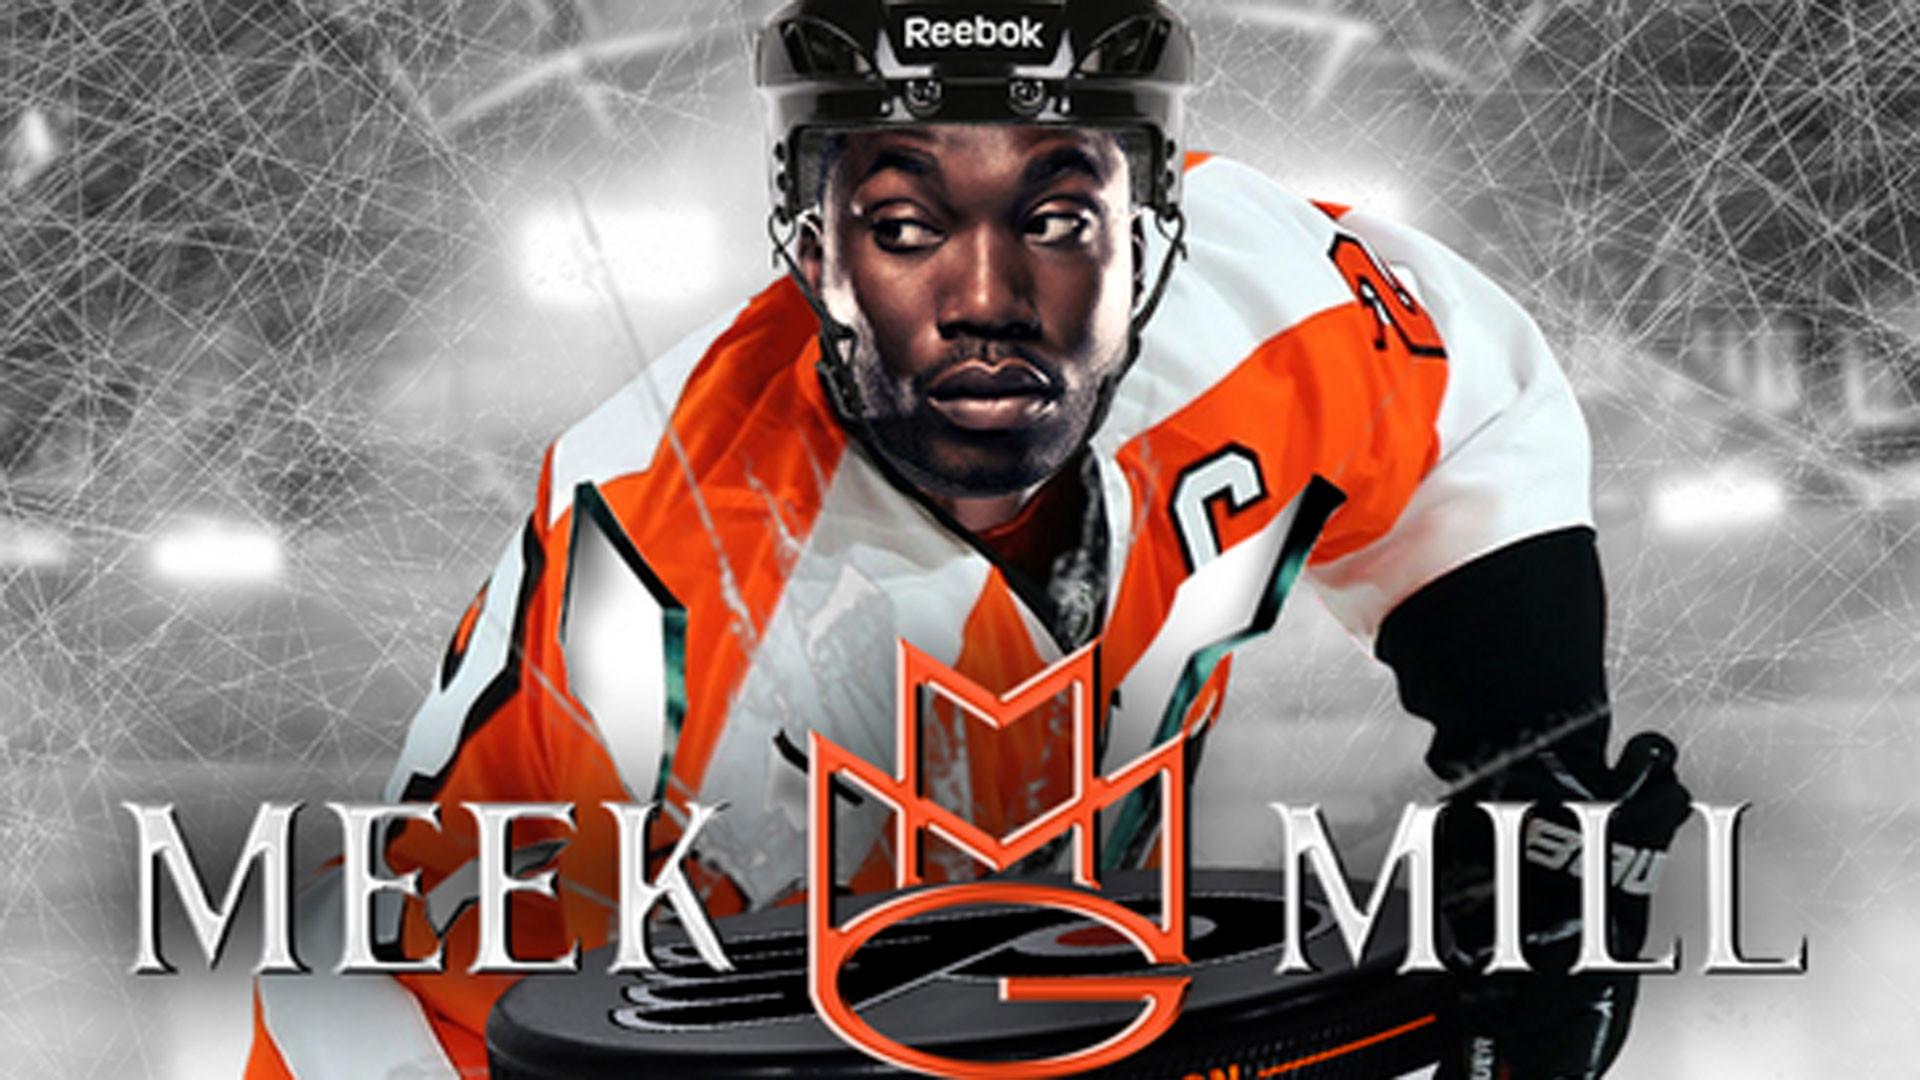 Meek Mill is a 'Philadelphia Flyer' on mixtape cover; MMG hockey fight?    NHL   Sporting News